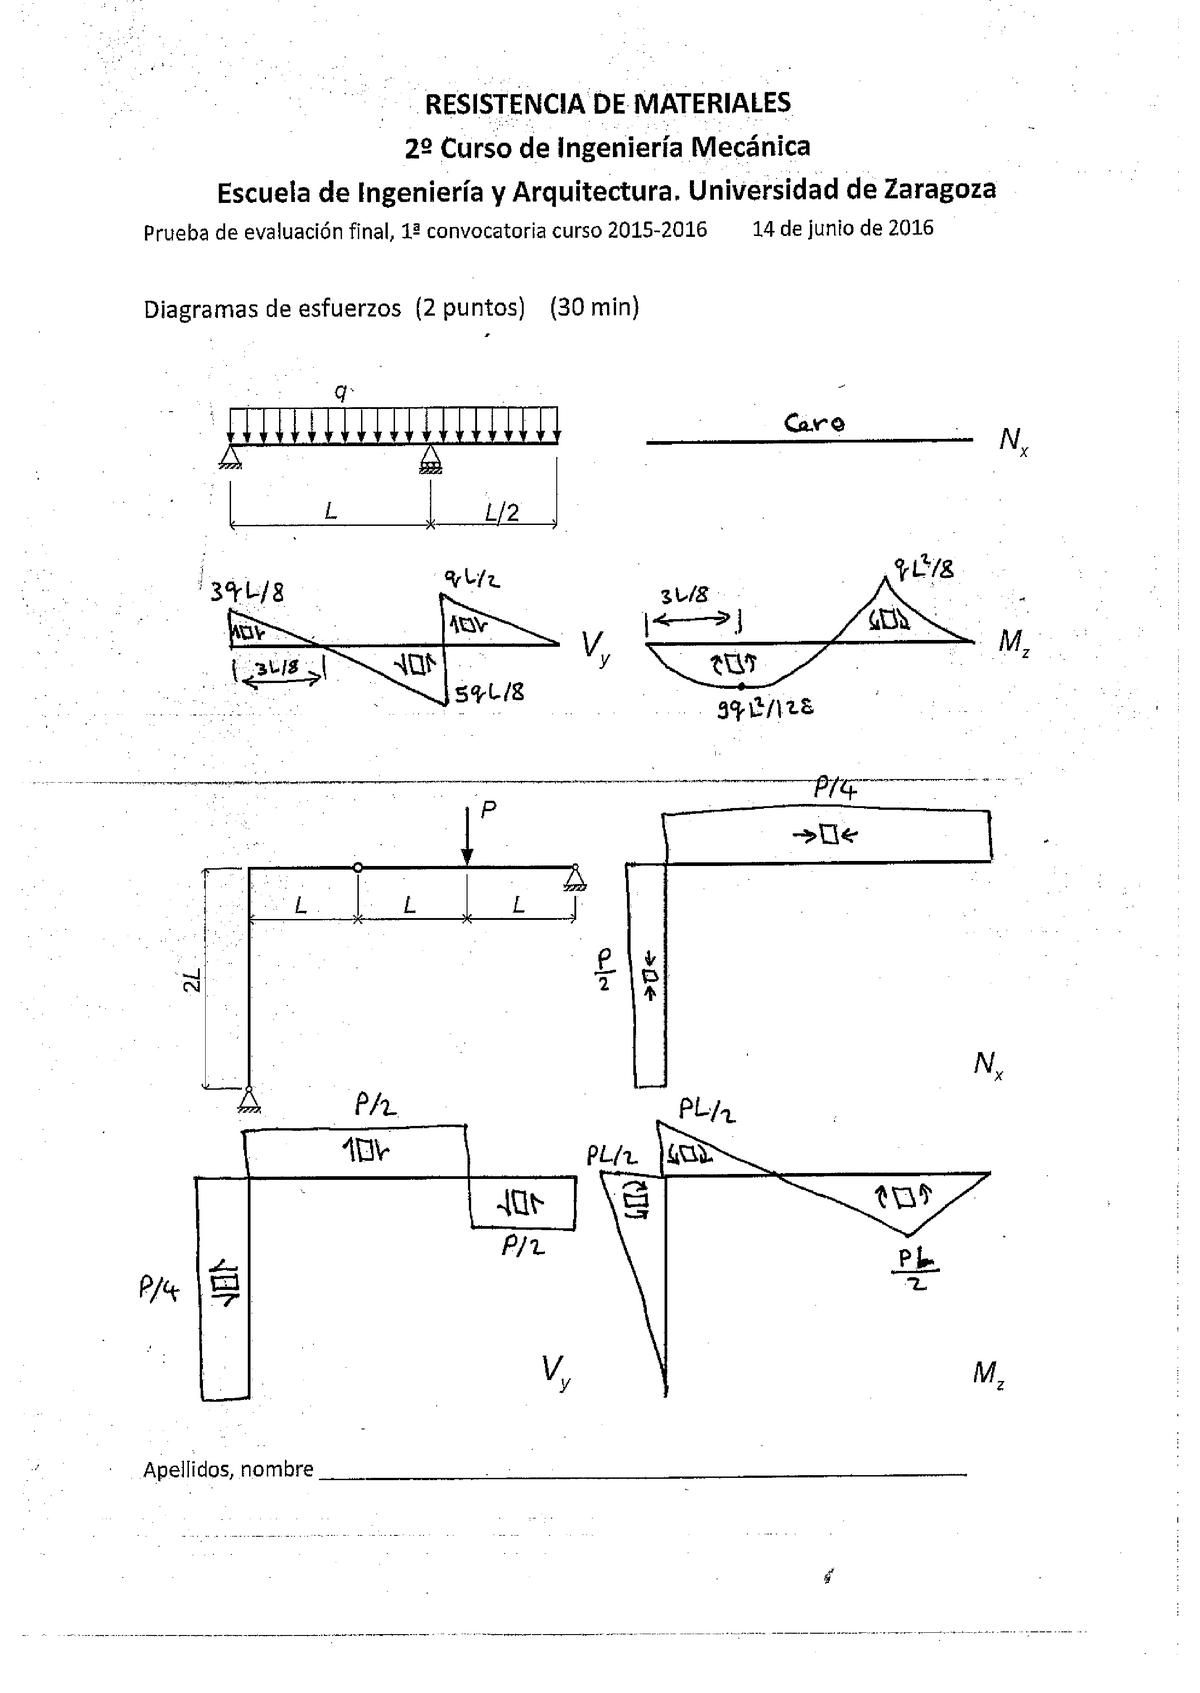 ruedas de 8 a 20 mm de di/ámetro fijo para motor de husillo Polea de 40 mm de un solo surco ZOYOSI tipo A 8 mm